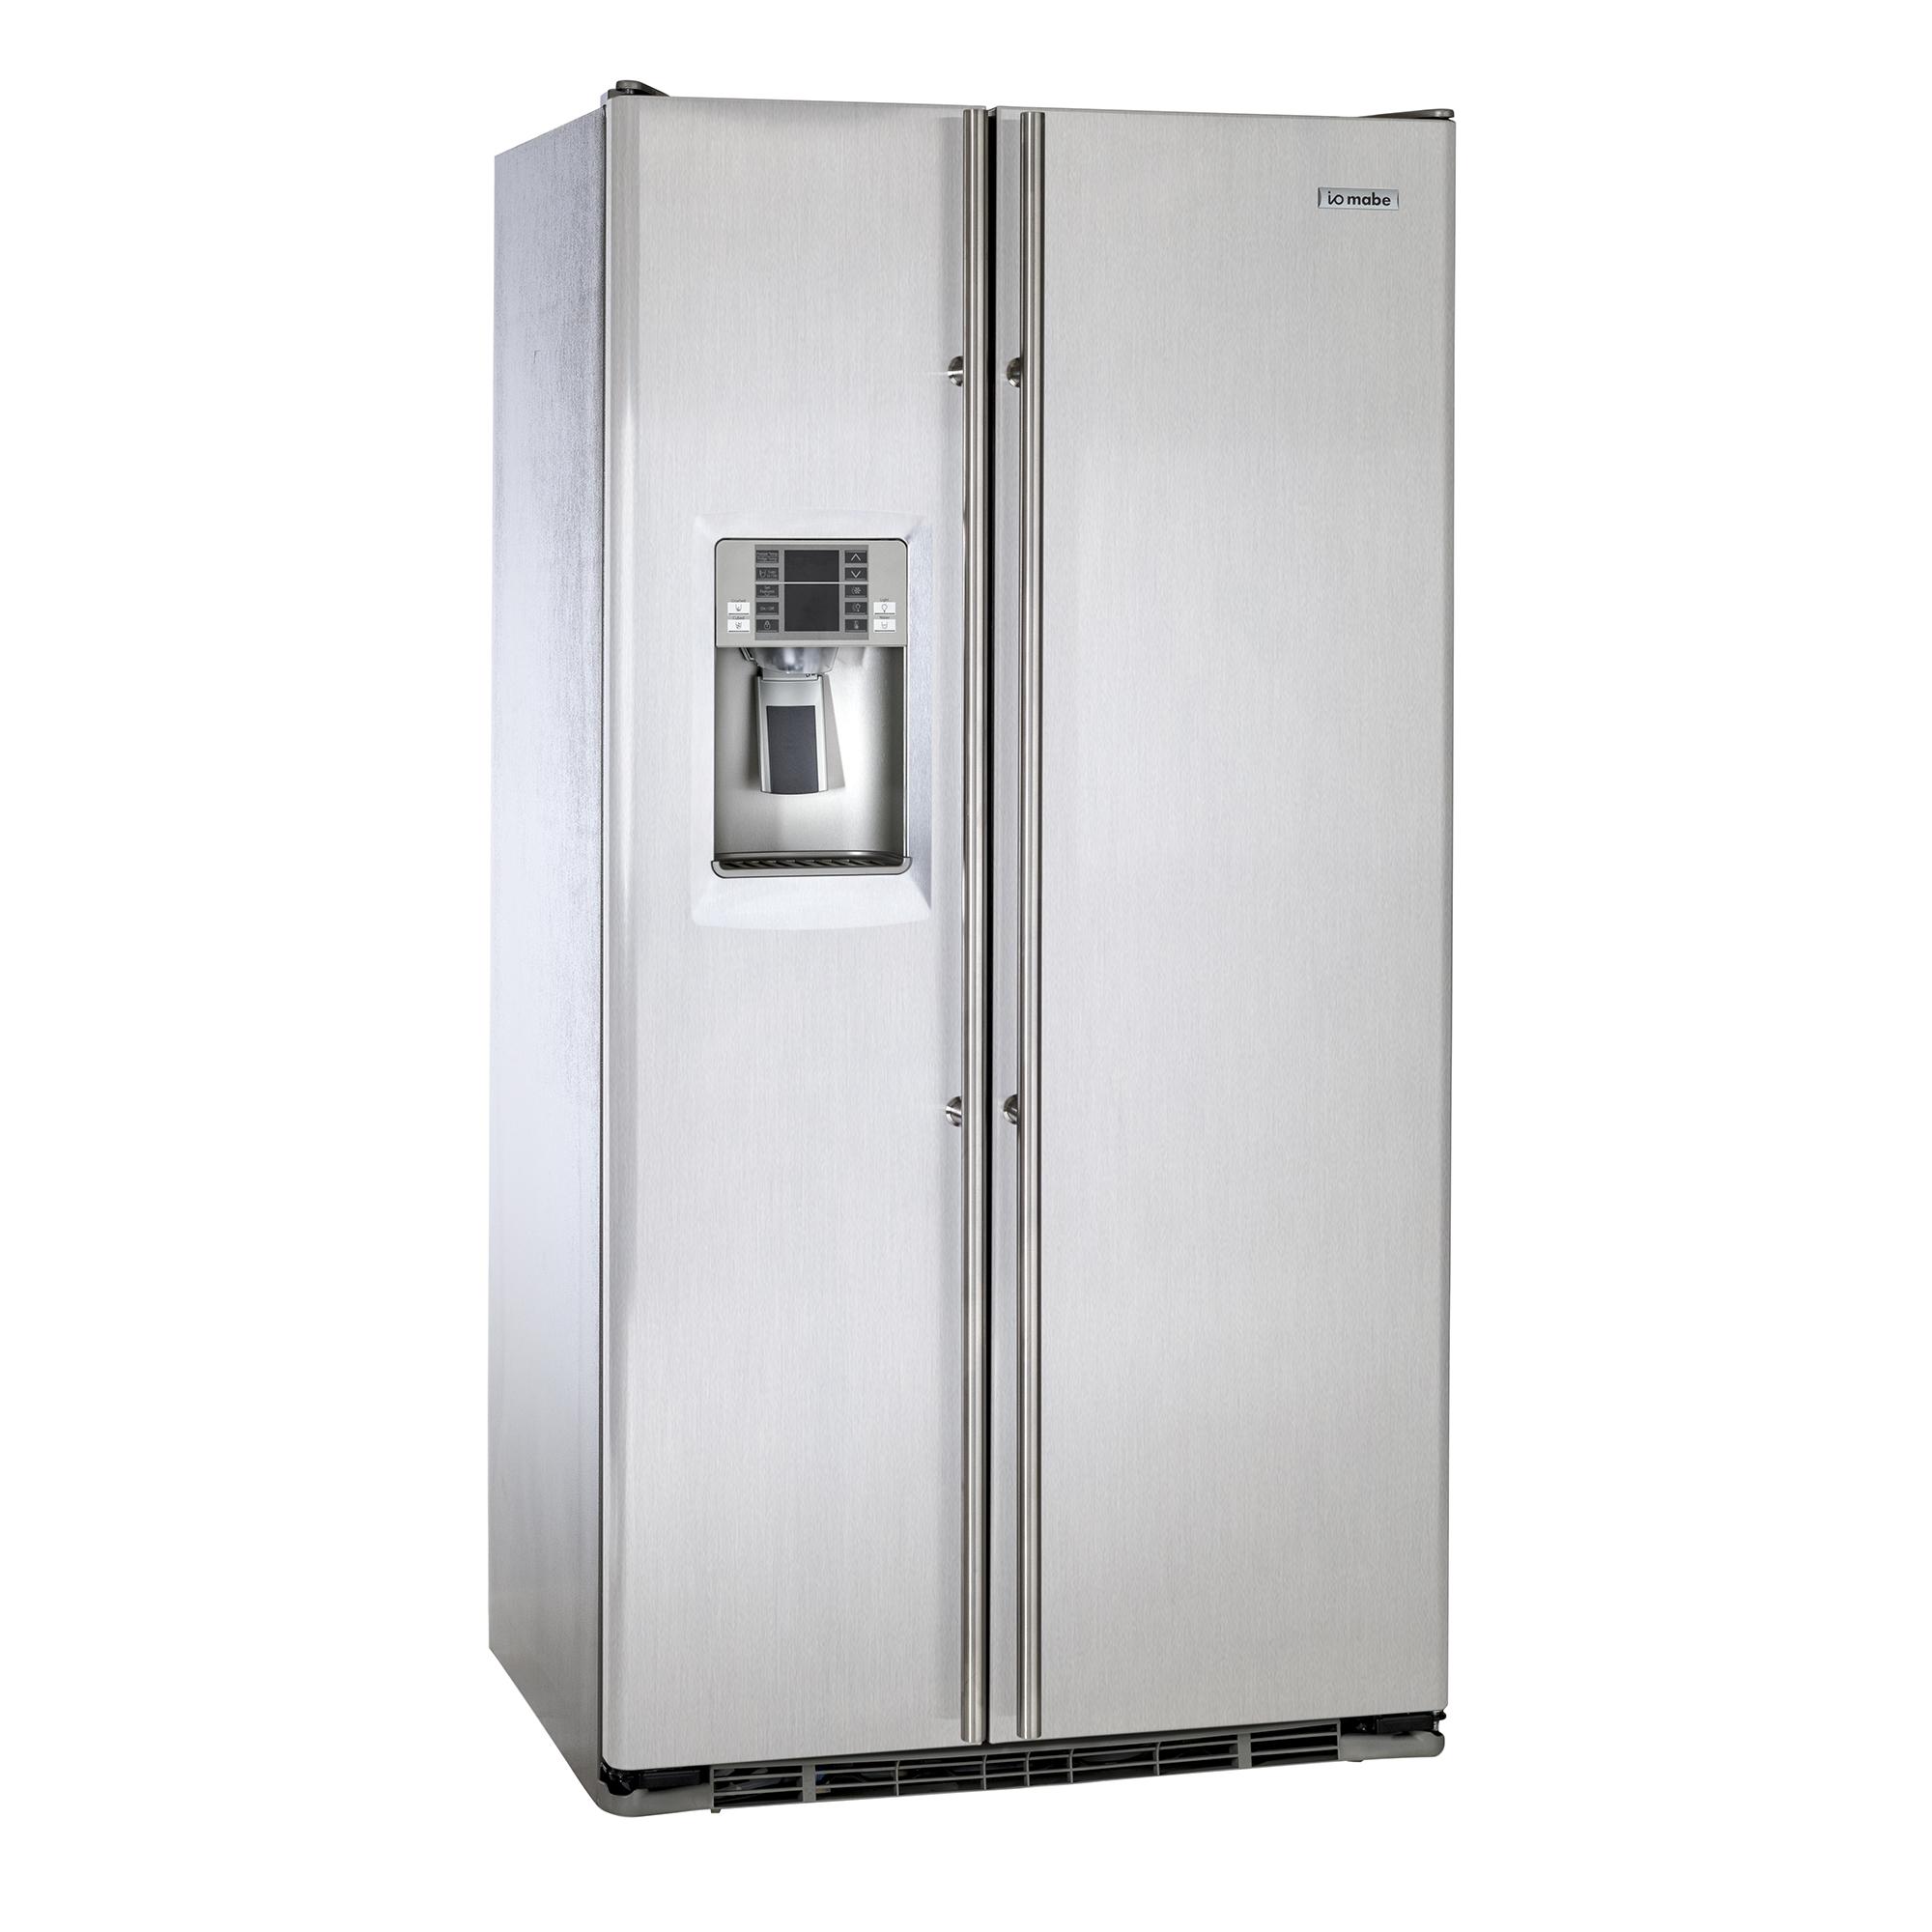 Холодильник (Side by Side) Io mabe ORE24VGHFSS